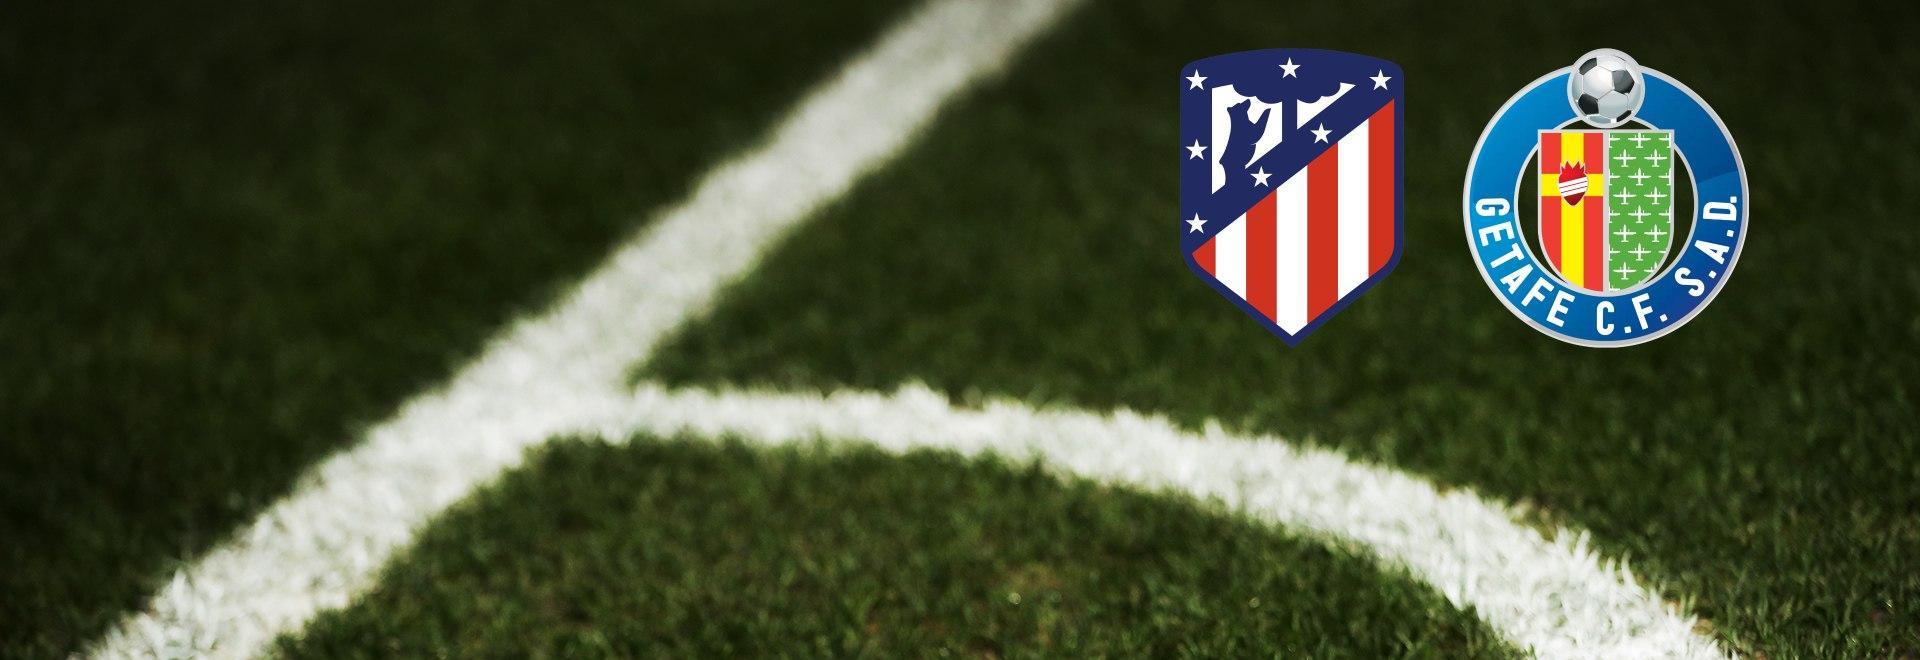 Atletico Madrid - Getafe. 16a g.